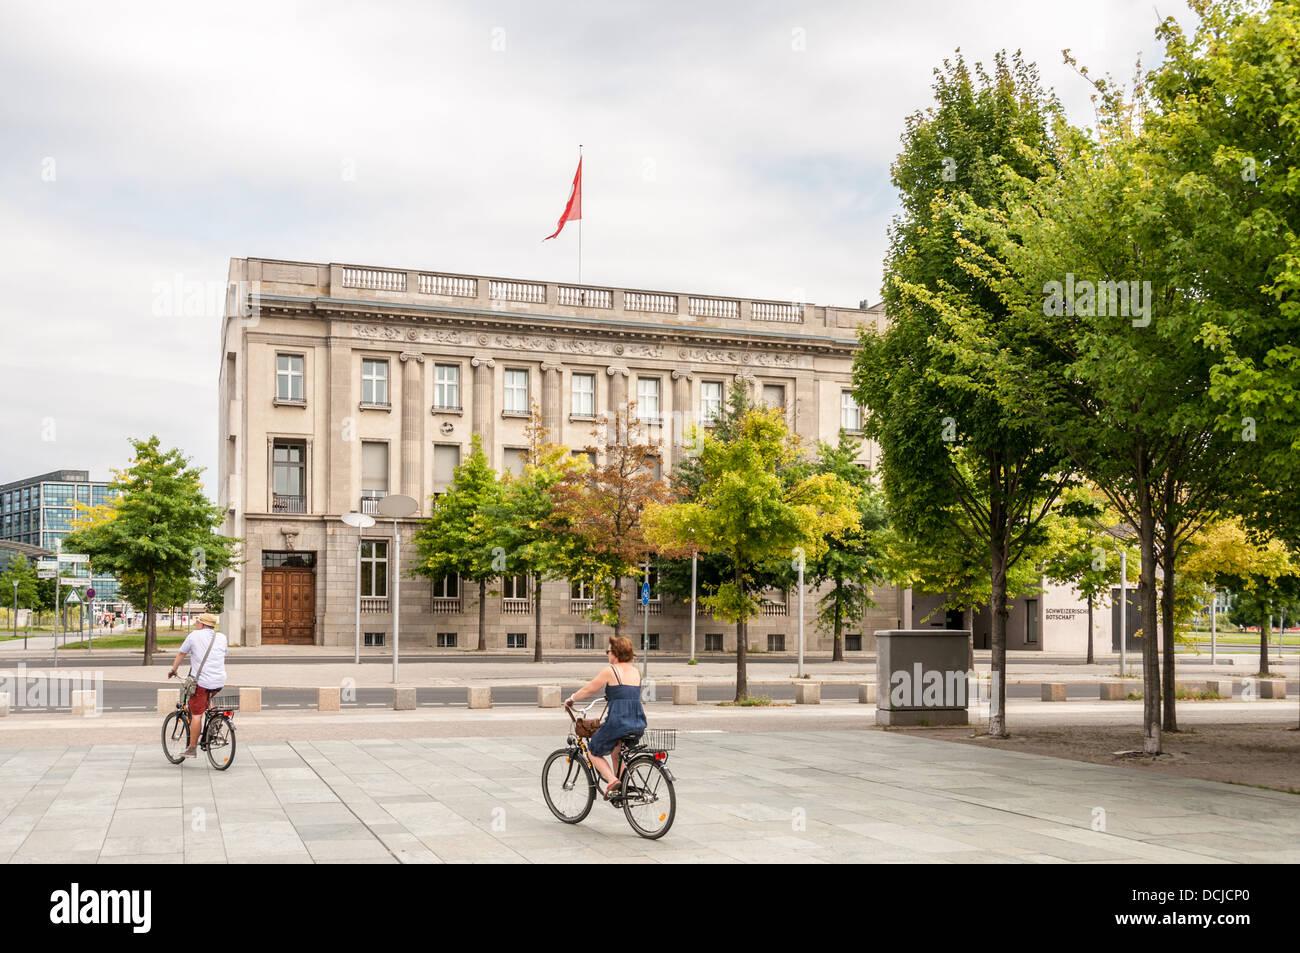 Swiss Embassy - Scweizerische Botschaft - Berlin Germany Stock Photo